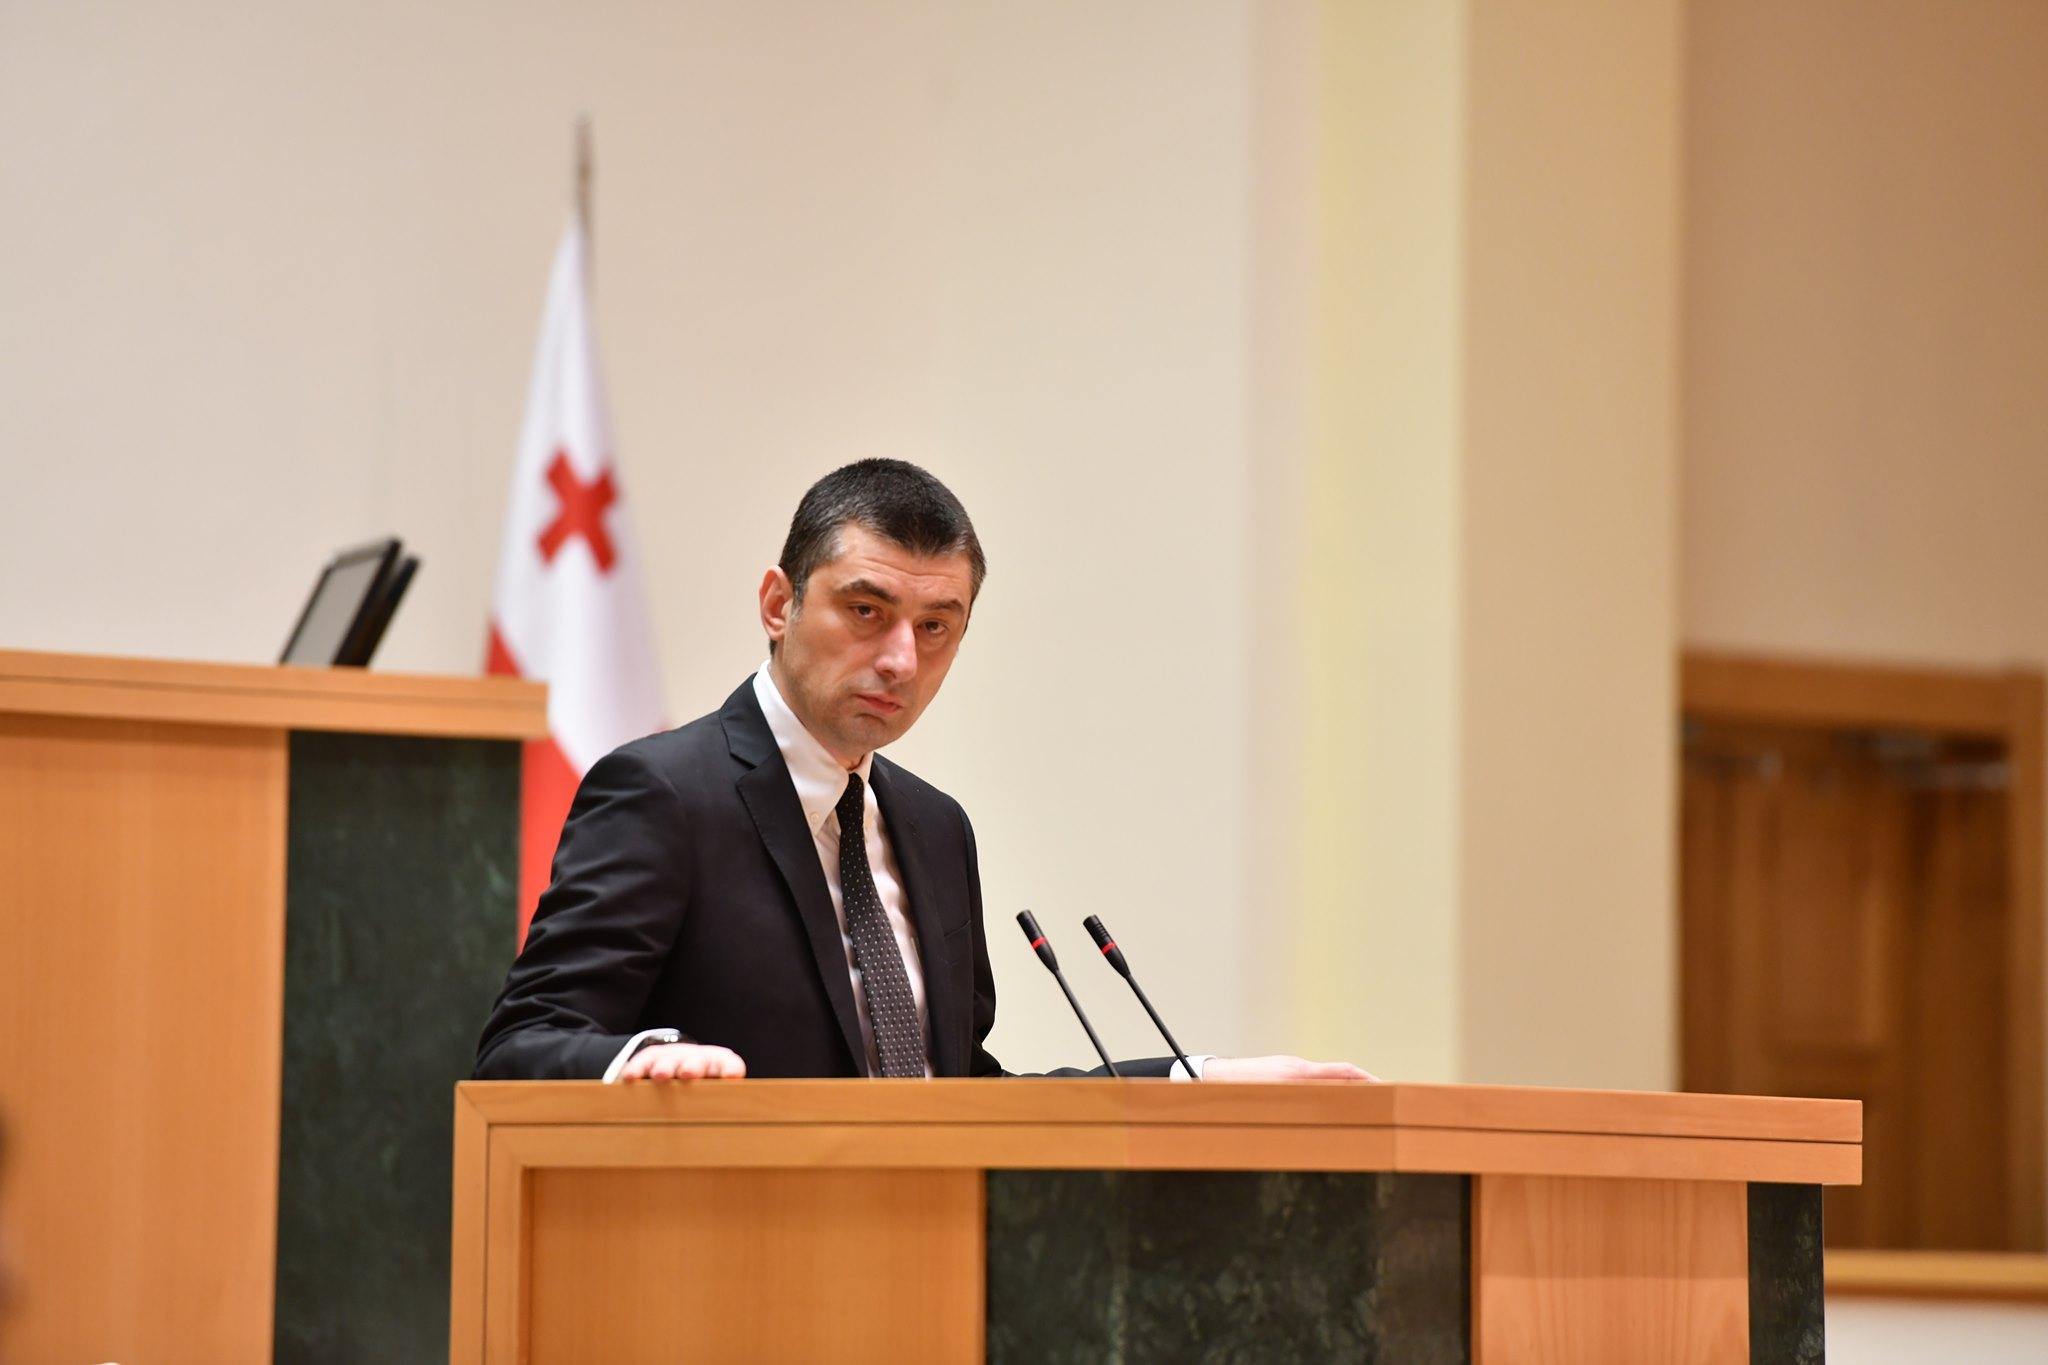 Giorgi Gakharia 23 правительство Грузии правительство Грузии